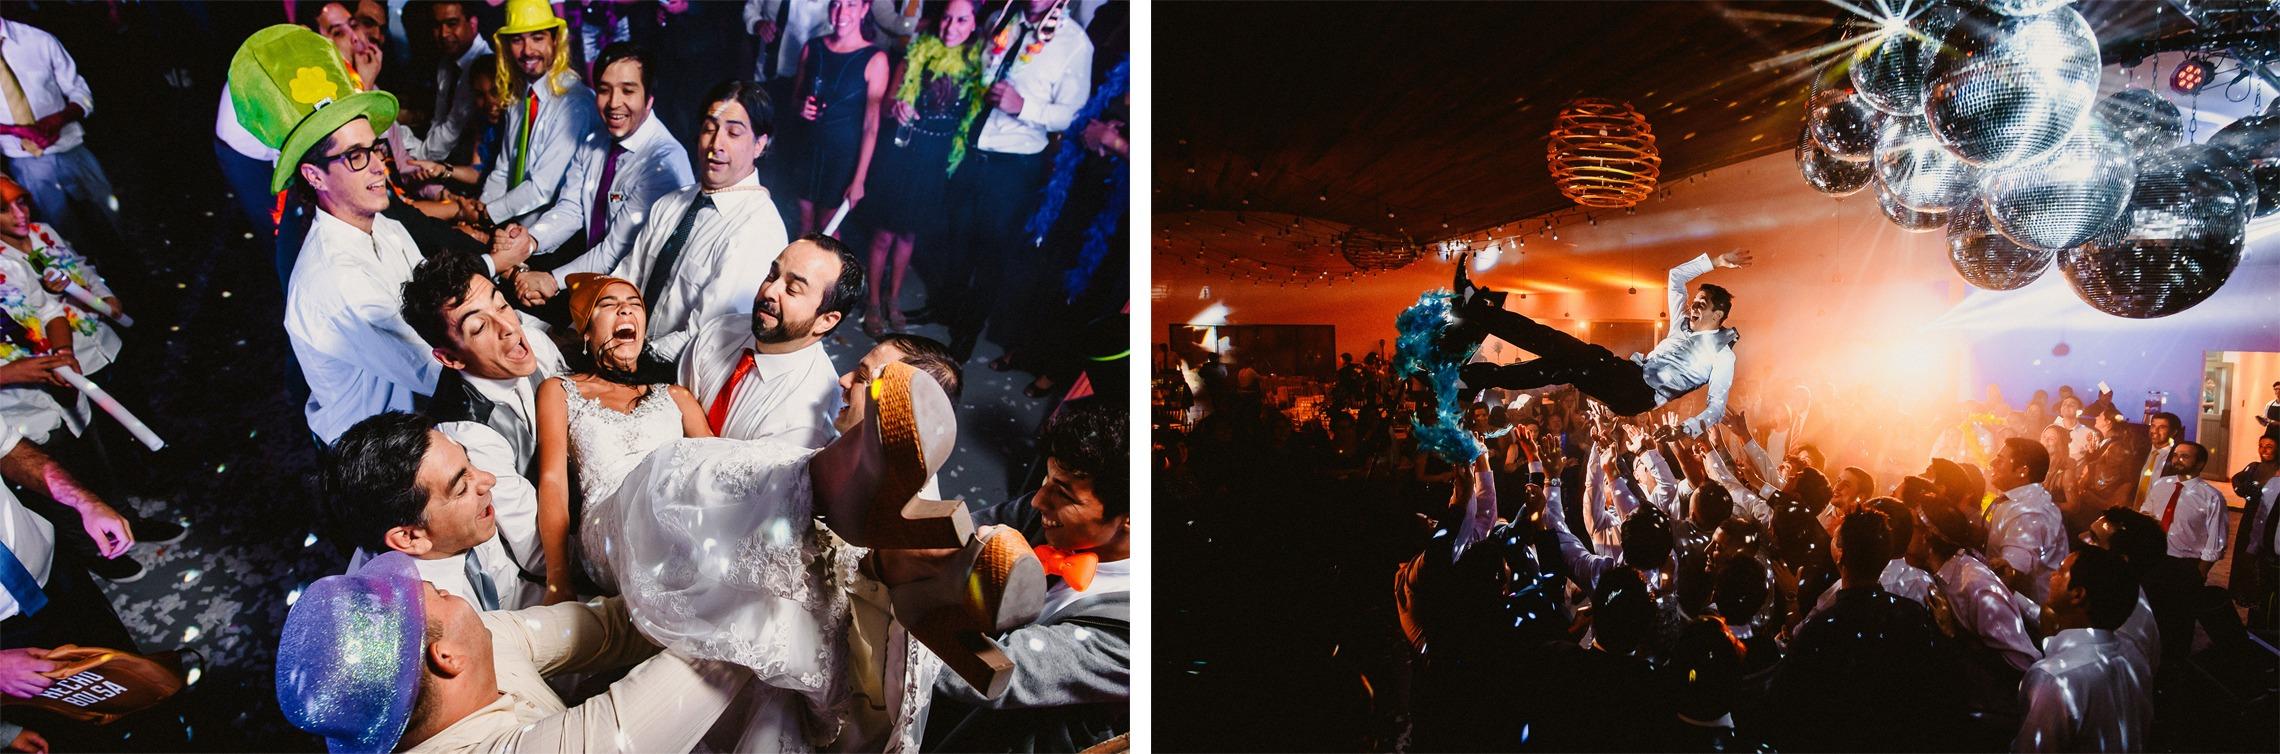 fotografo-de-matrimonios-chile-destination-wedding-casamento-destino-uruguay-argentina-brasil-colombia